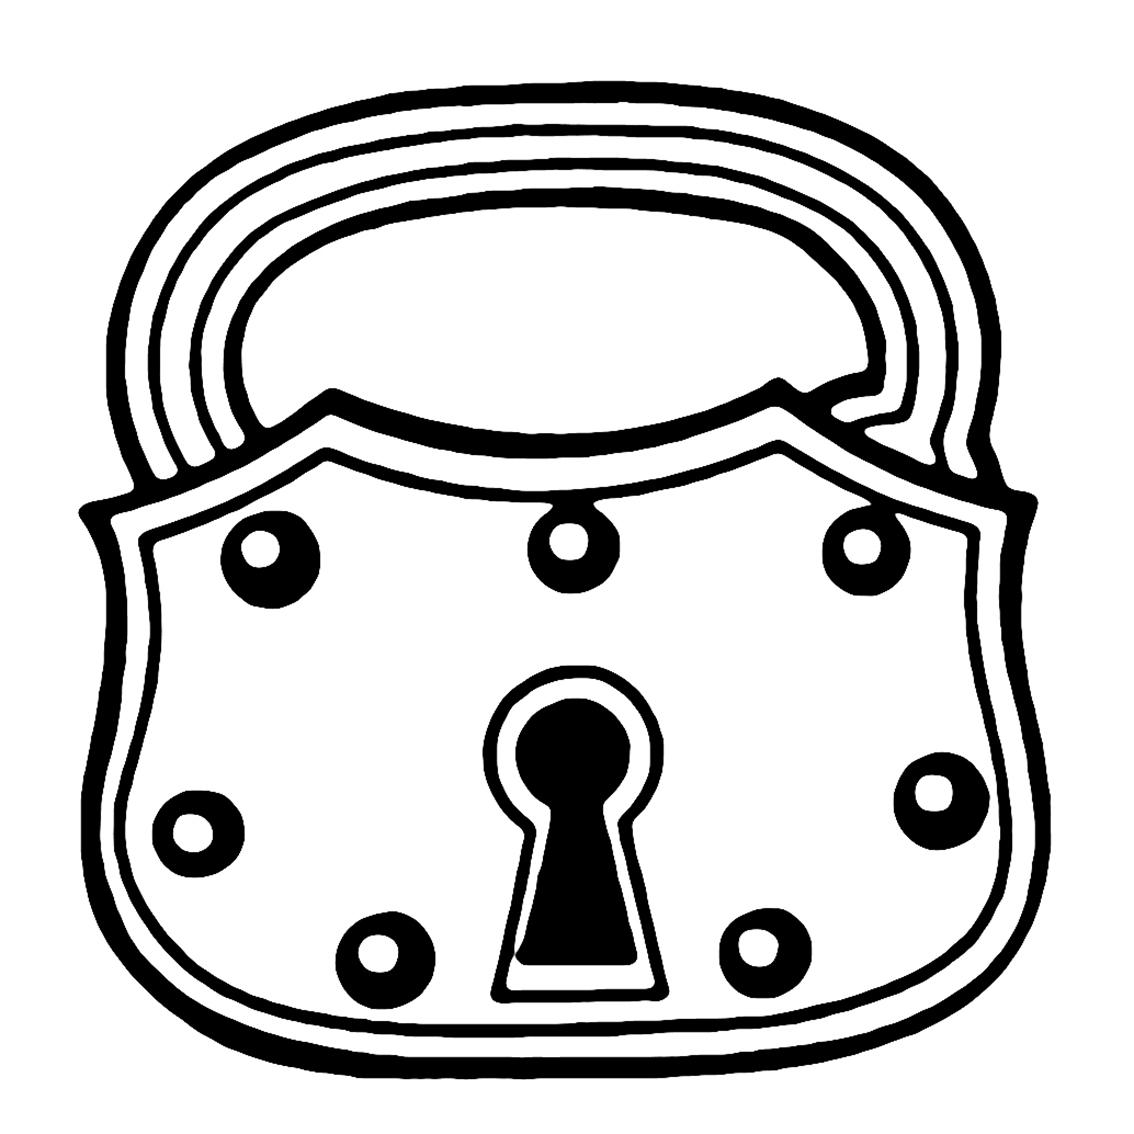 12 Skeleton Key Clipart Images And Locks